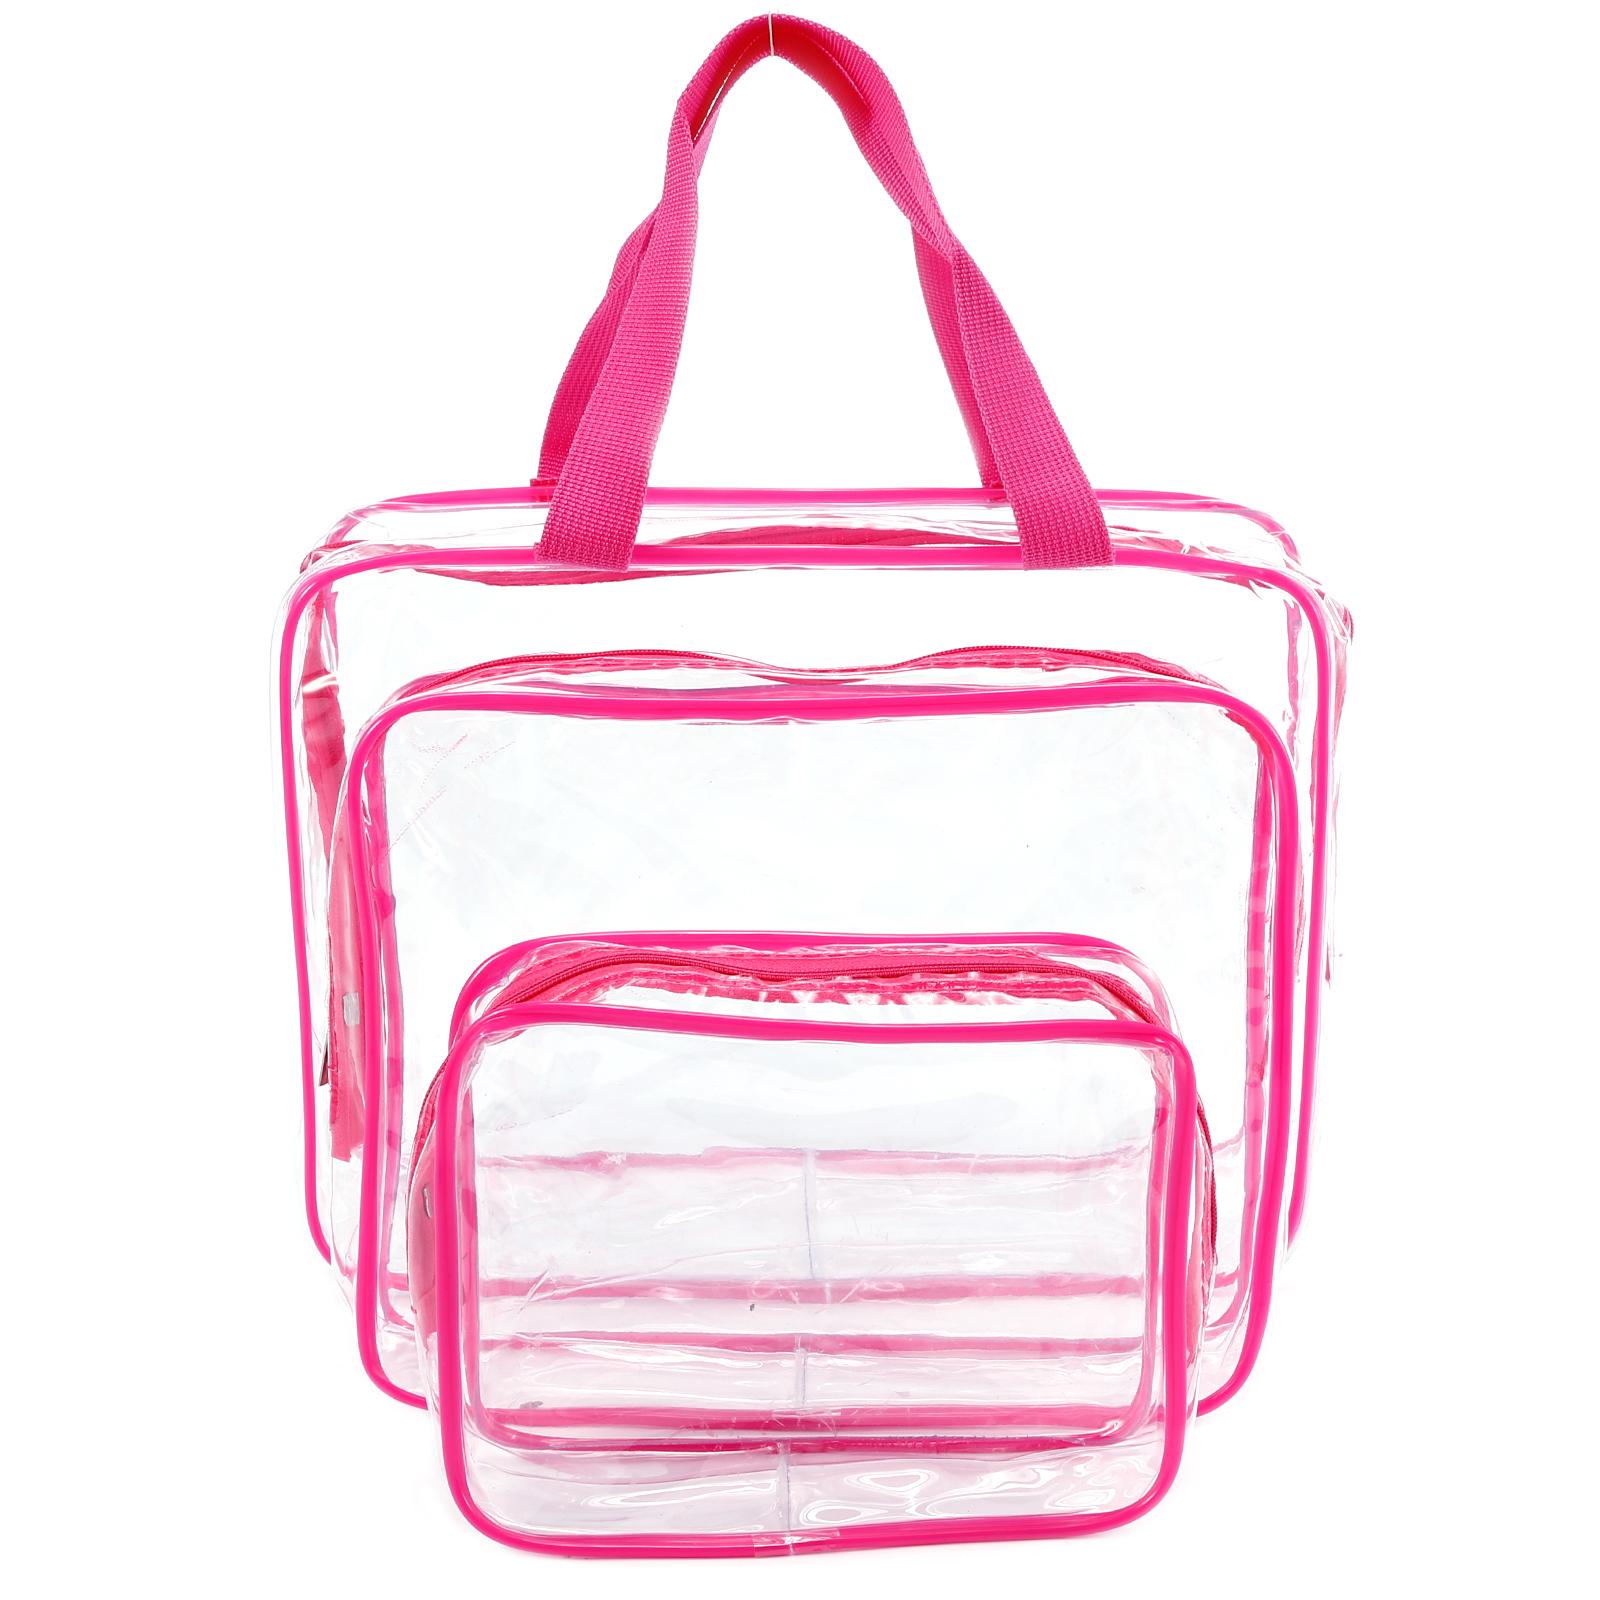 f259c3fc7b4d Details about Transparent Travel Bag Waterproof Toiletries Bag Liquid Bags  for Flights